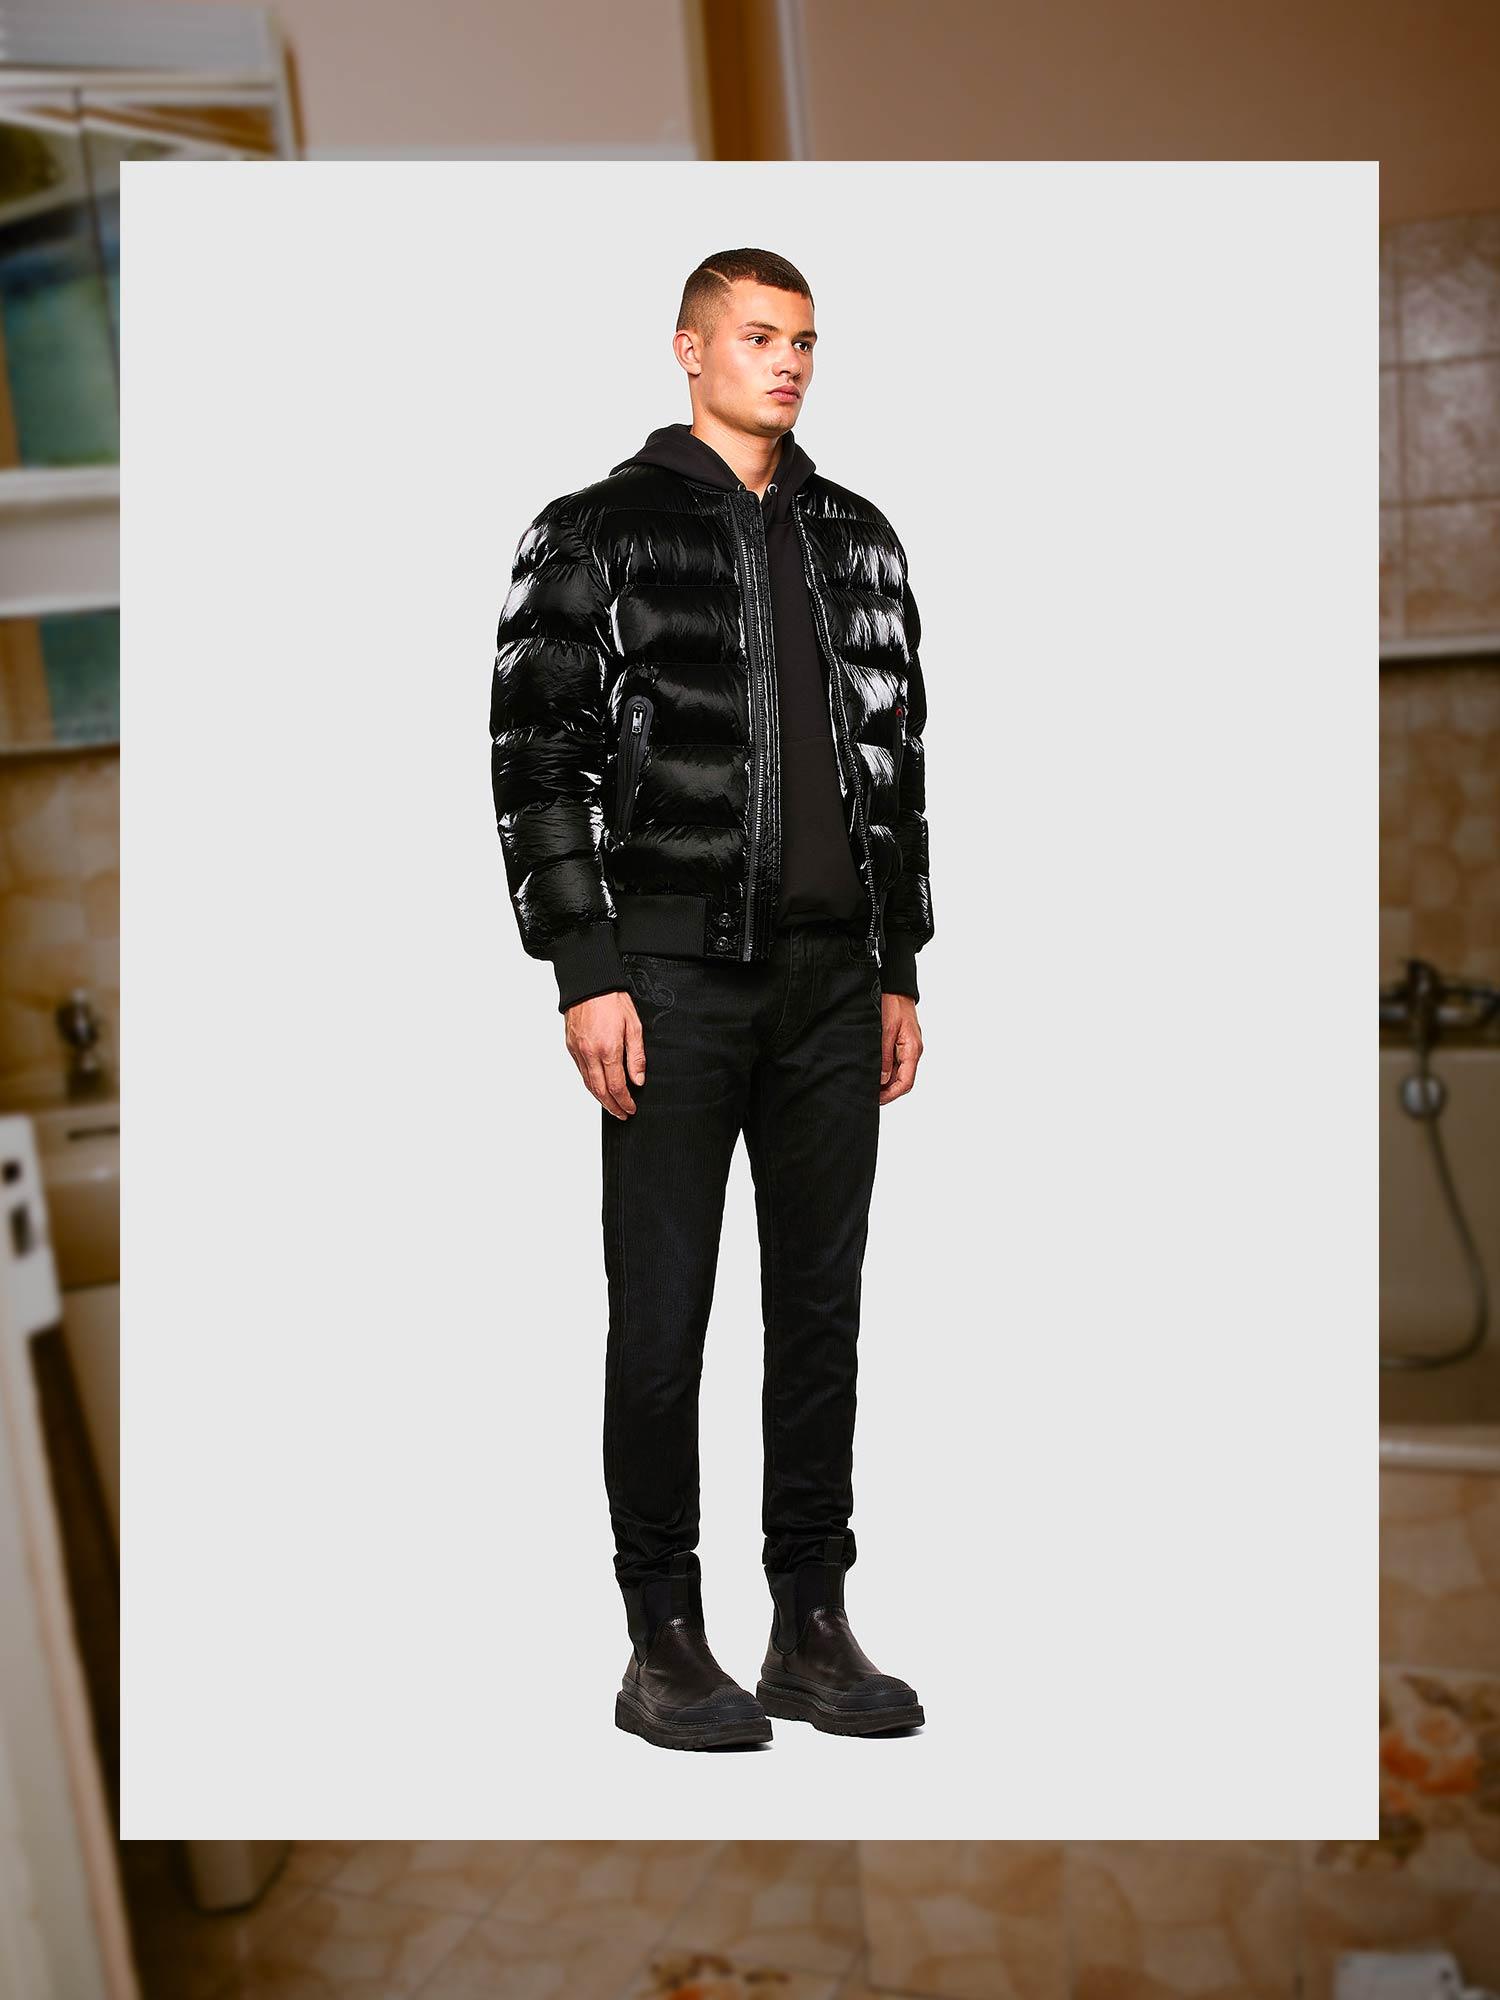 Diesel Jeans Slim Fit: D-Strukt   Shop Now on Diesel.com